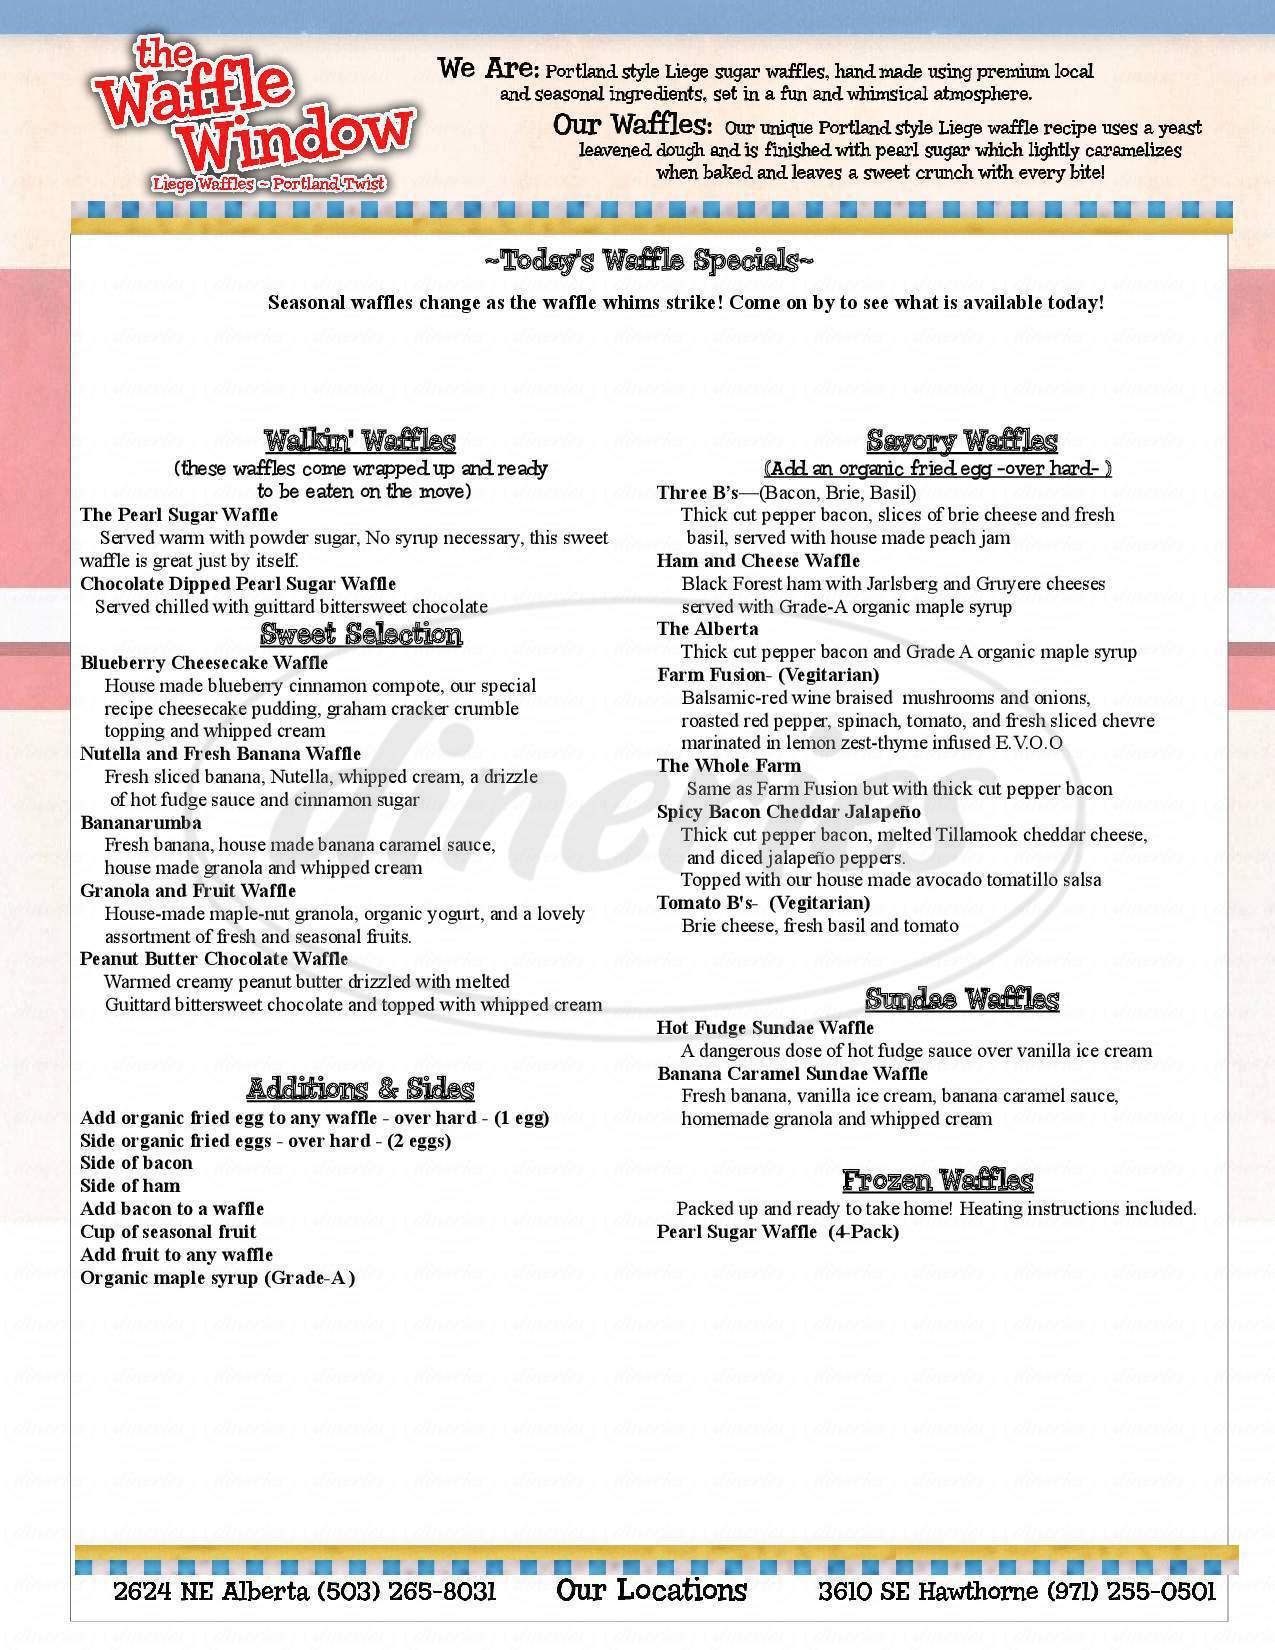 menu for The Waffle Window